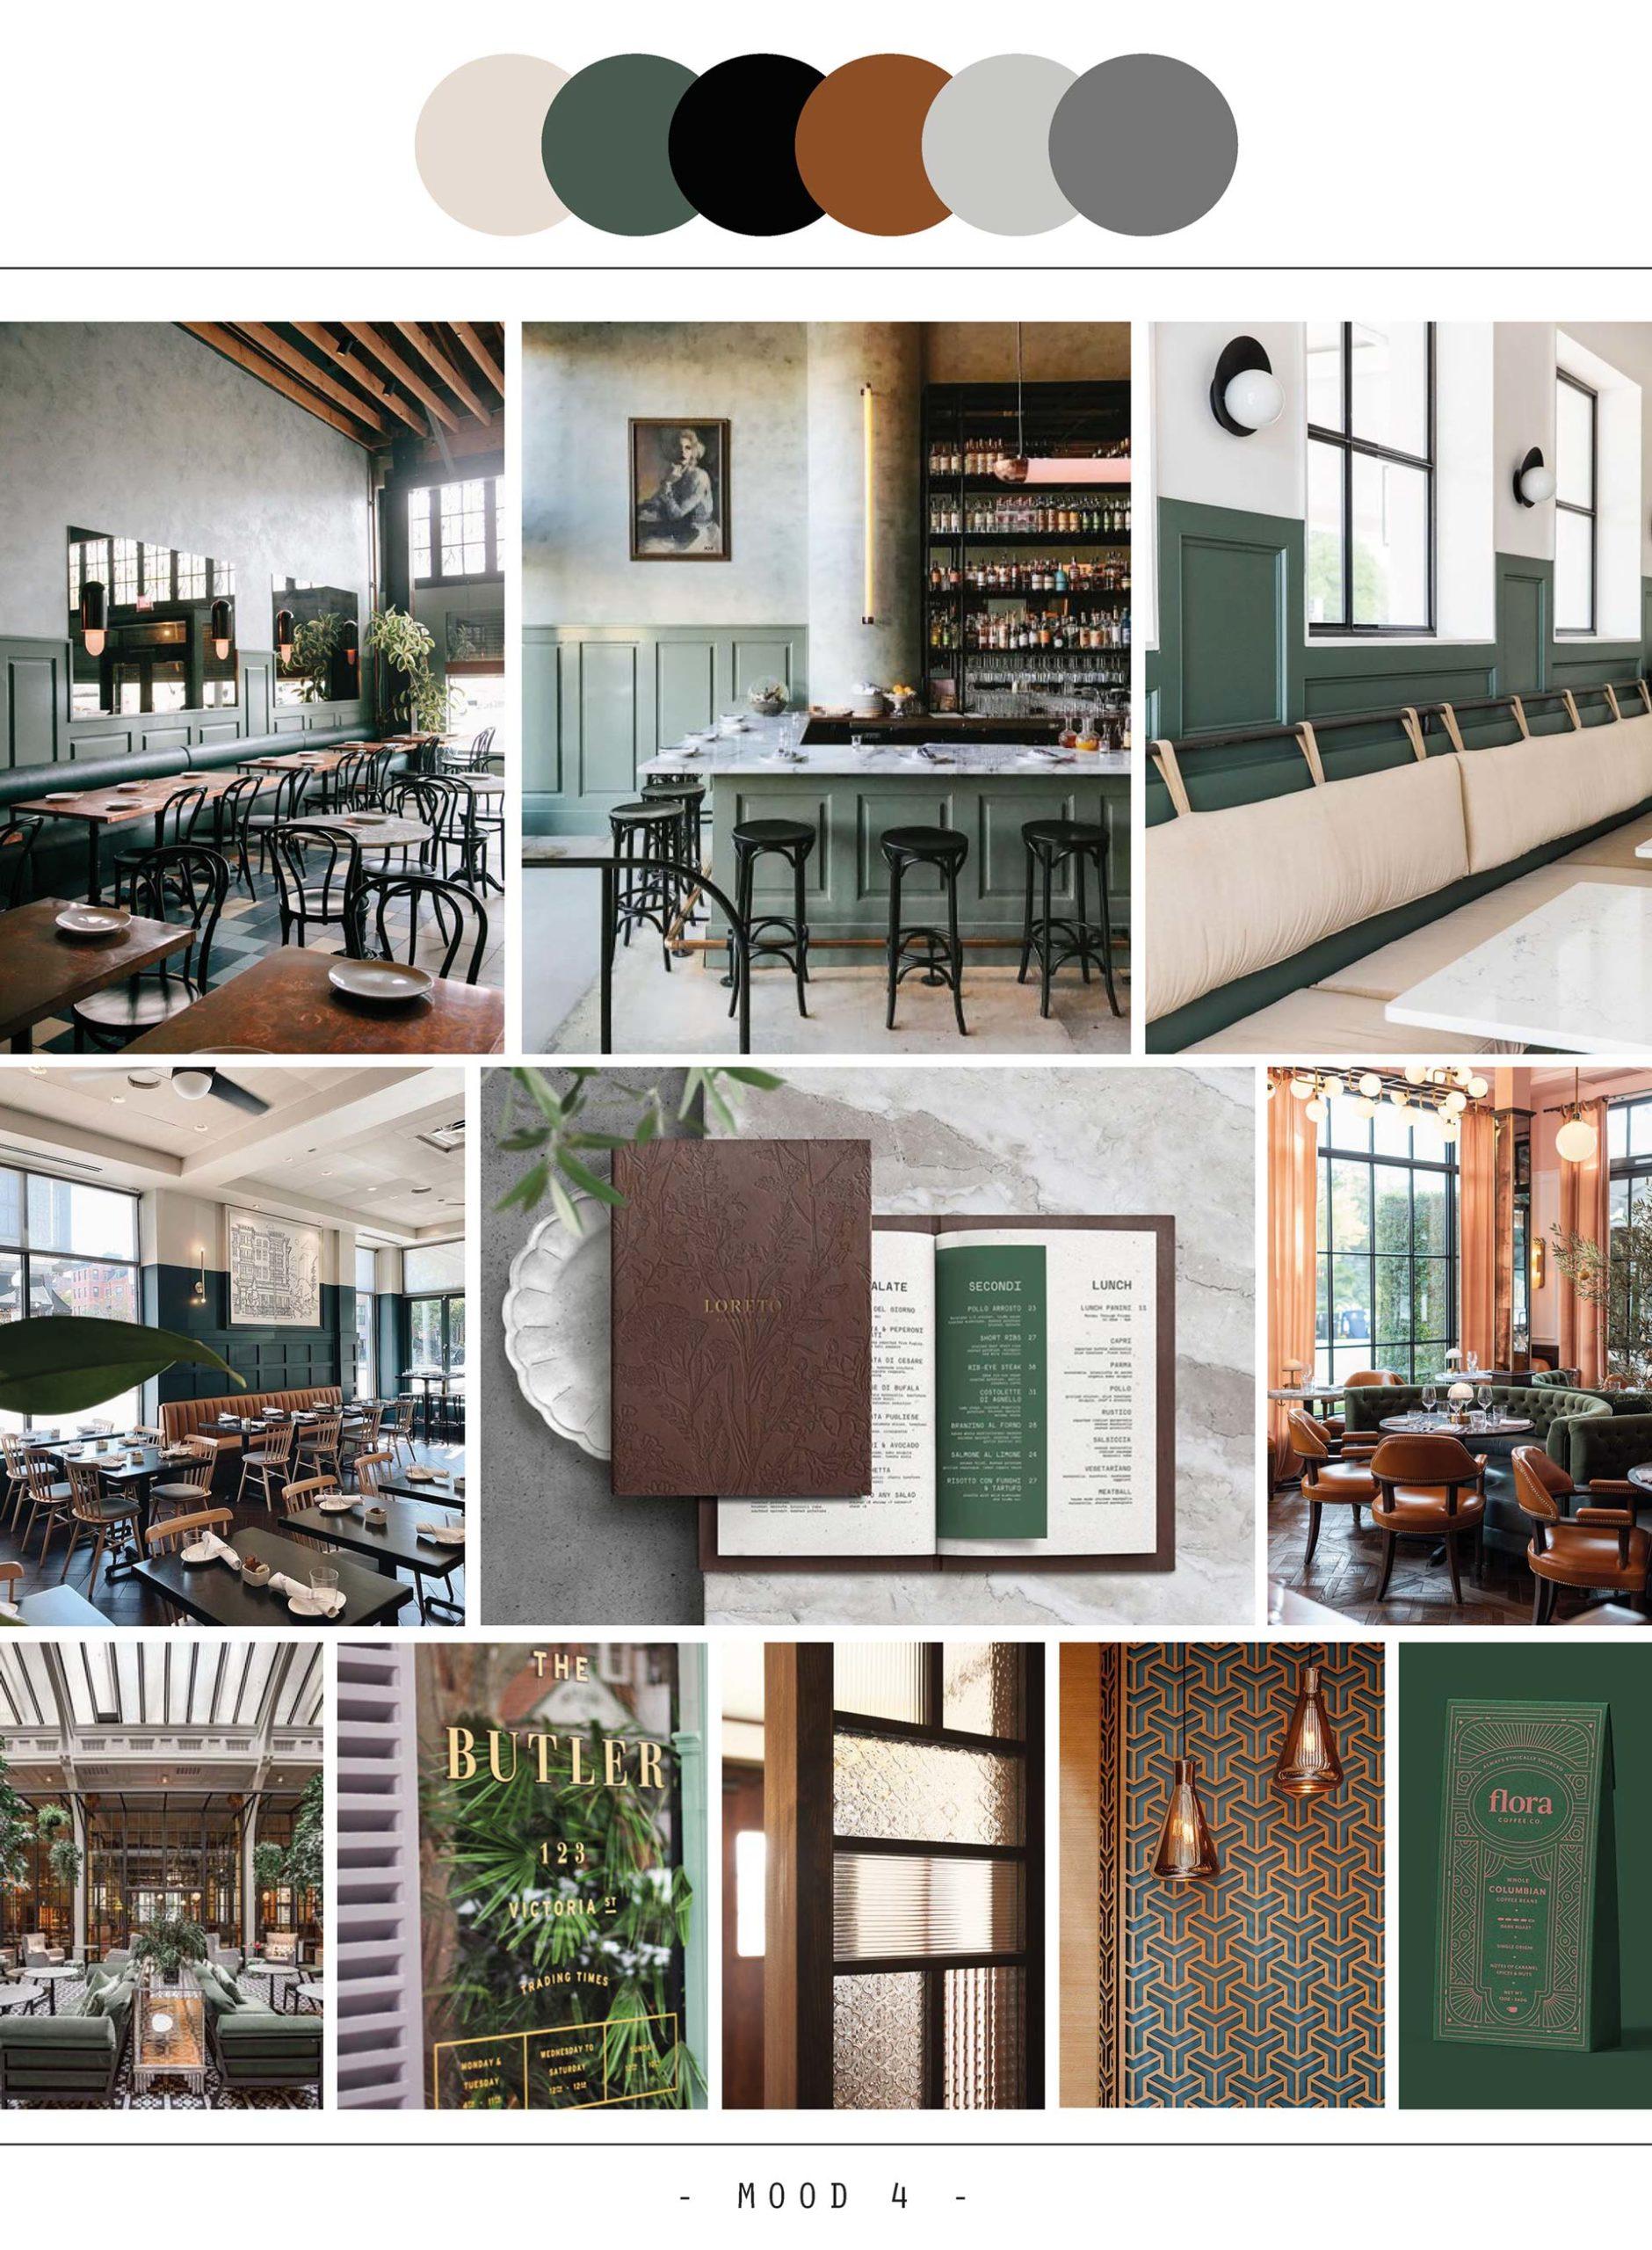 interior-mood-kaffeehaus-wittekind-4